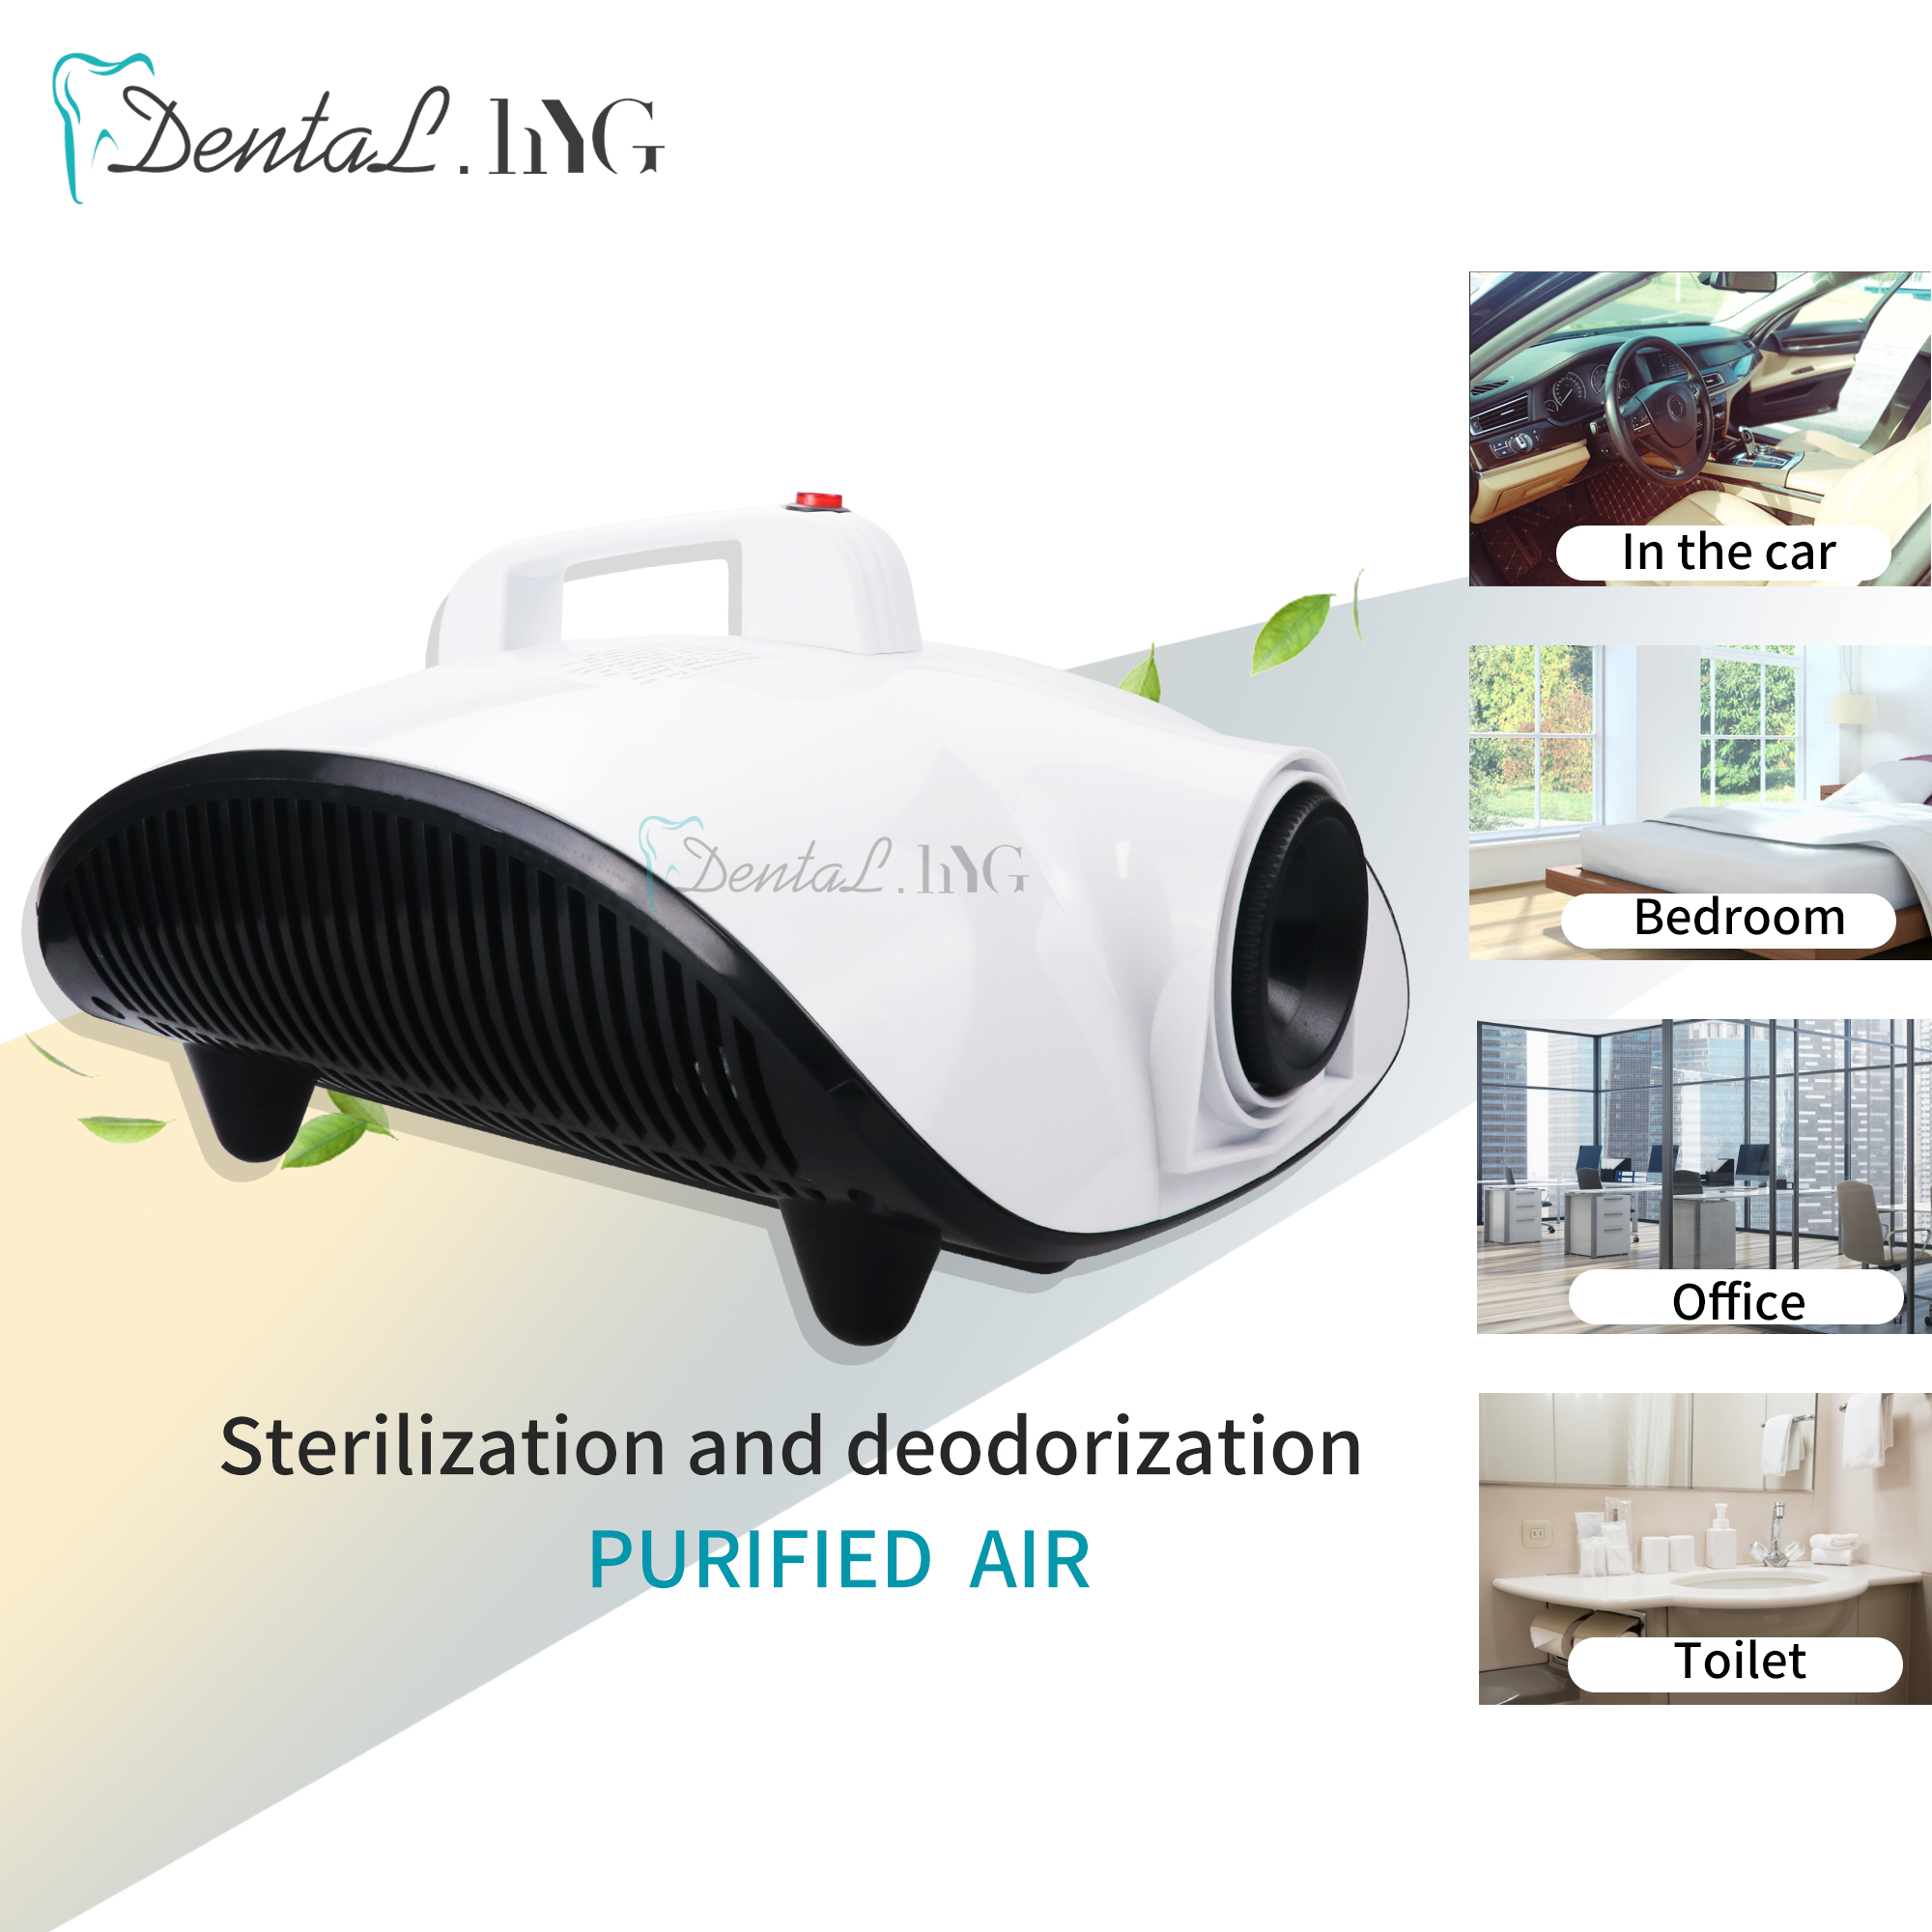 1500W 2in1 Auto Disinfection Sterilization Fogger Sprayer Multi Timed QuantificationKill Virus Smoke Fog Machine Home Car